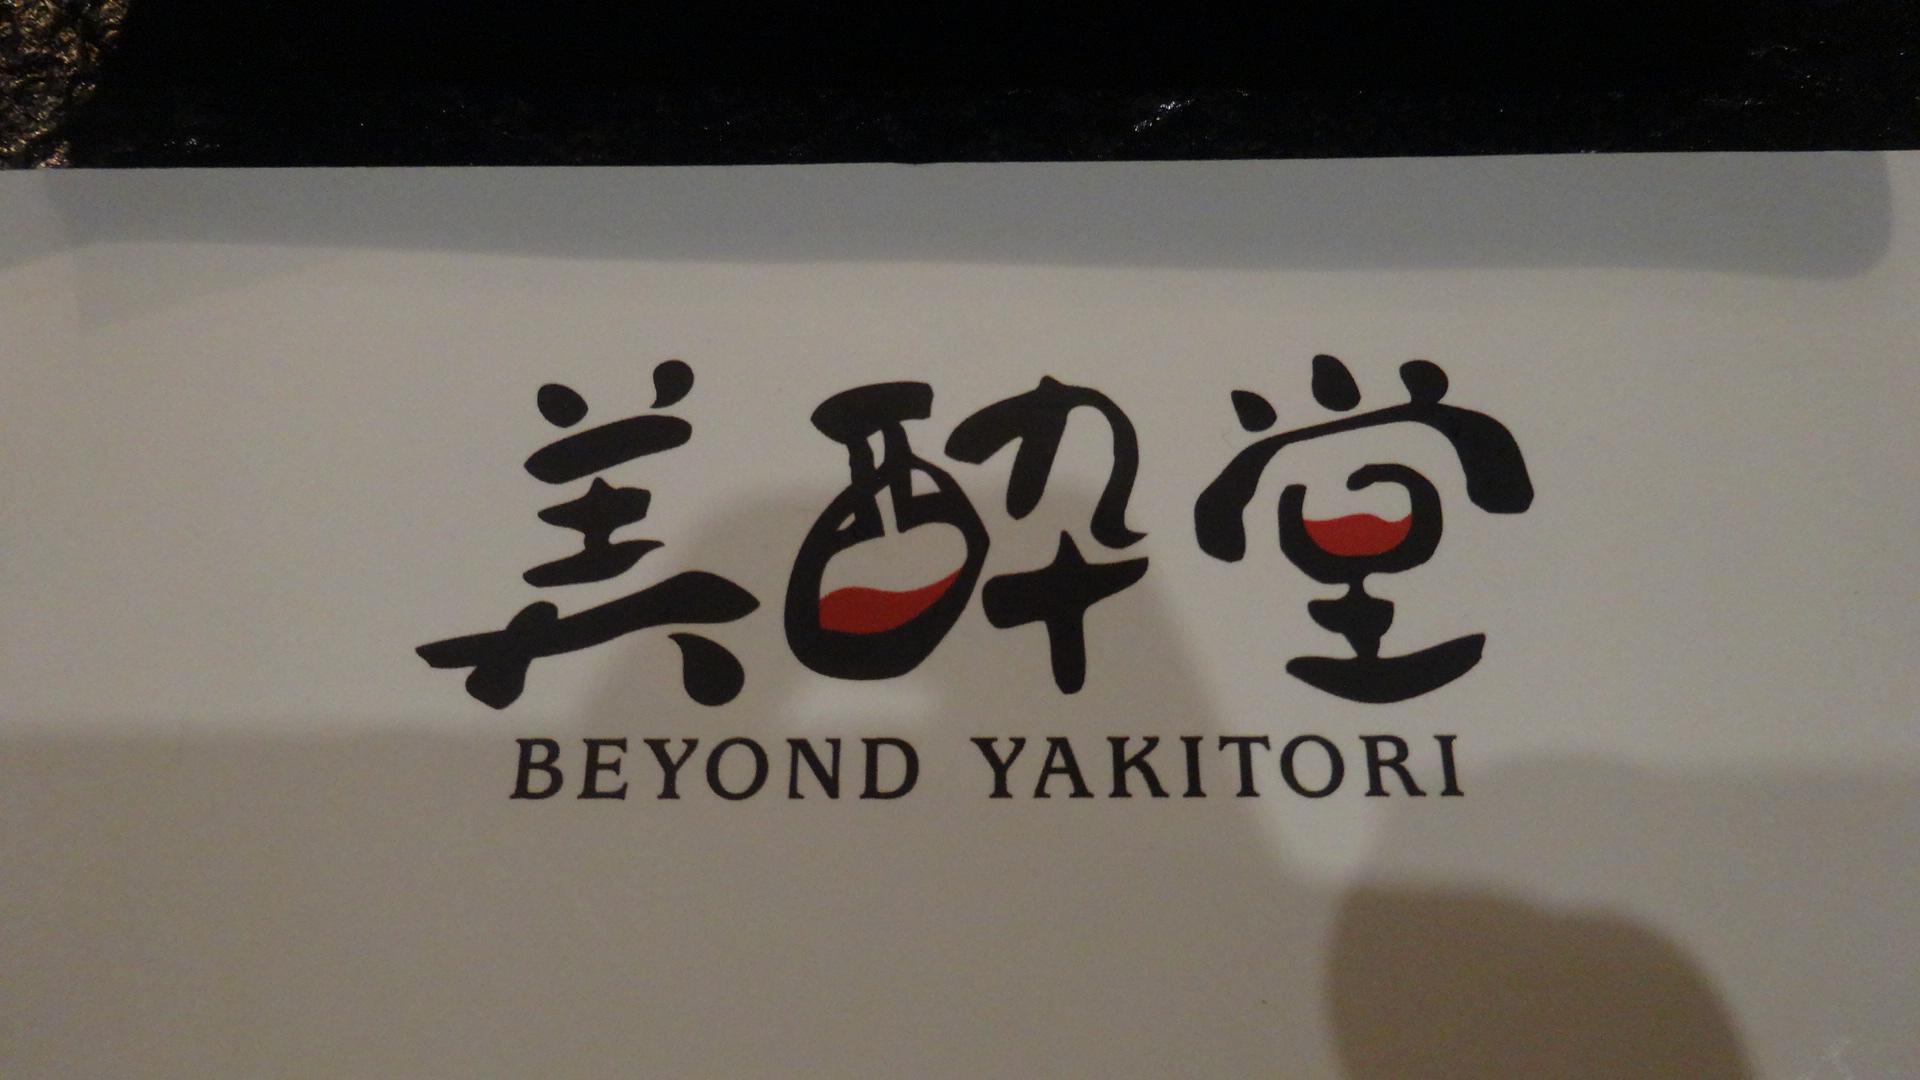 Beyond Yakitori